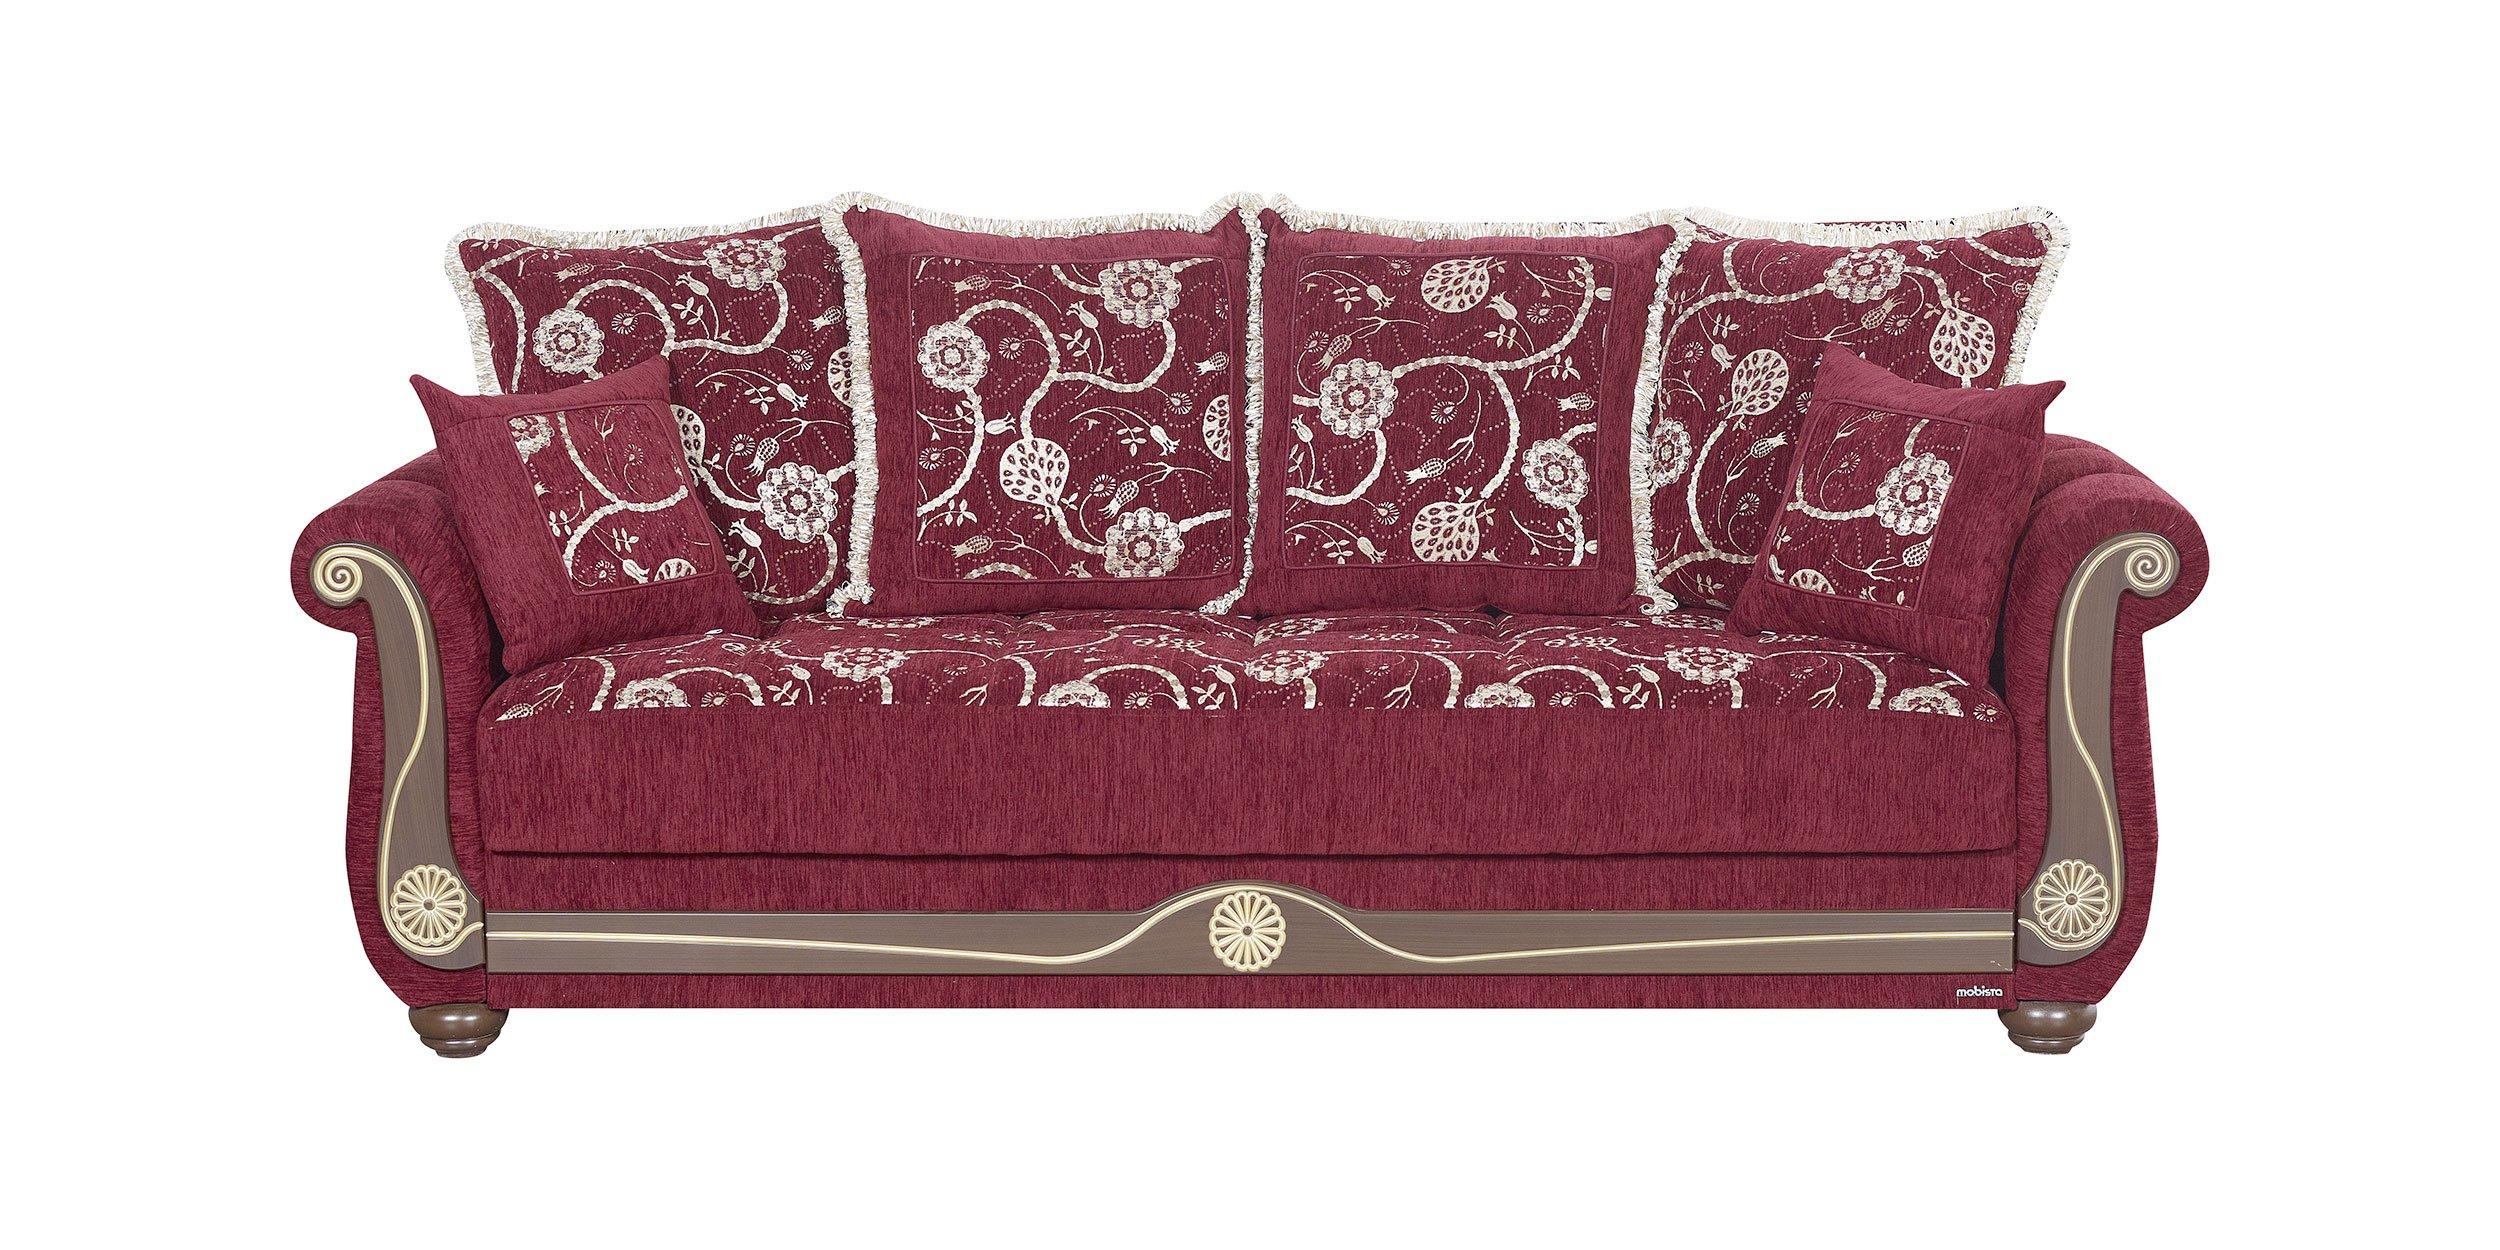 American Style Evita Flowers Burgundy Sofa Bed By Mobista